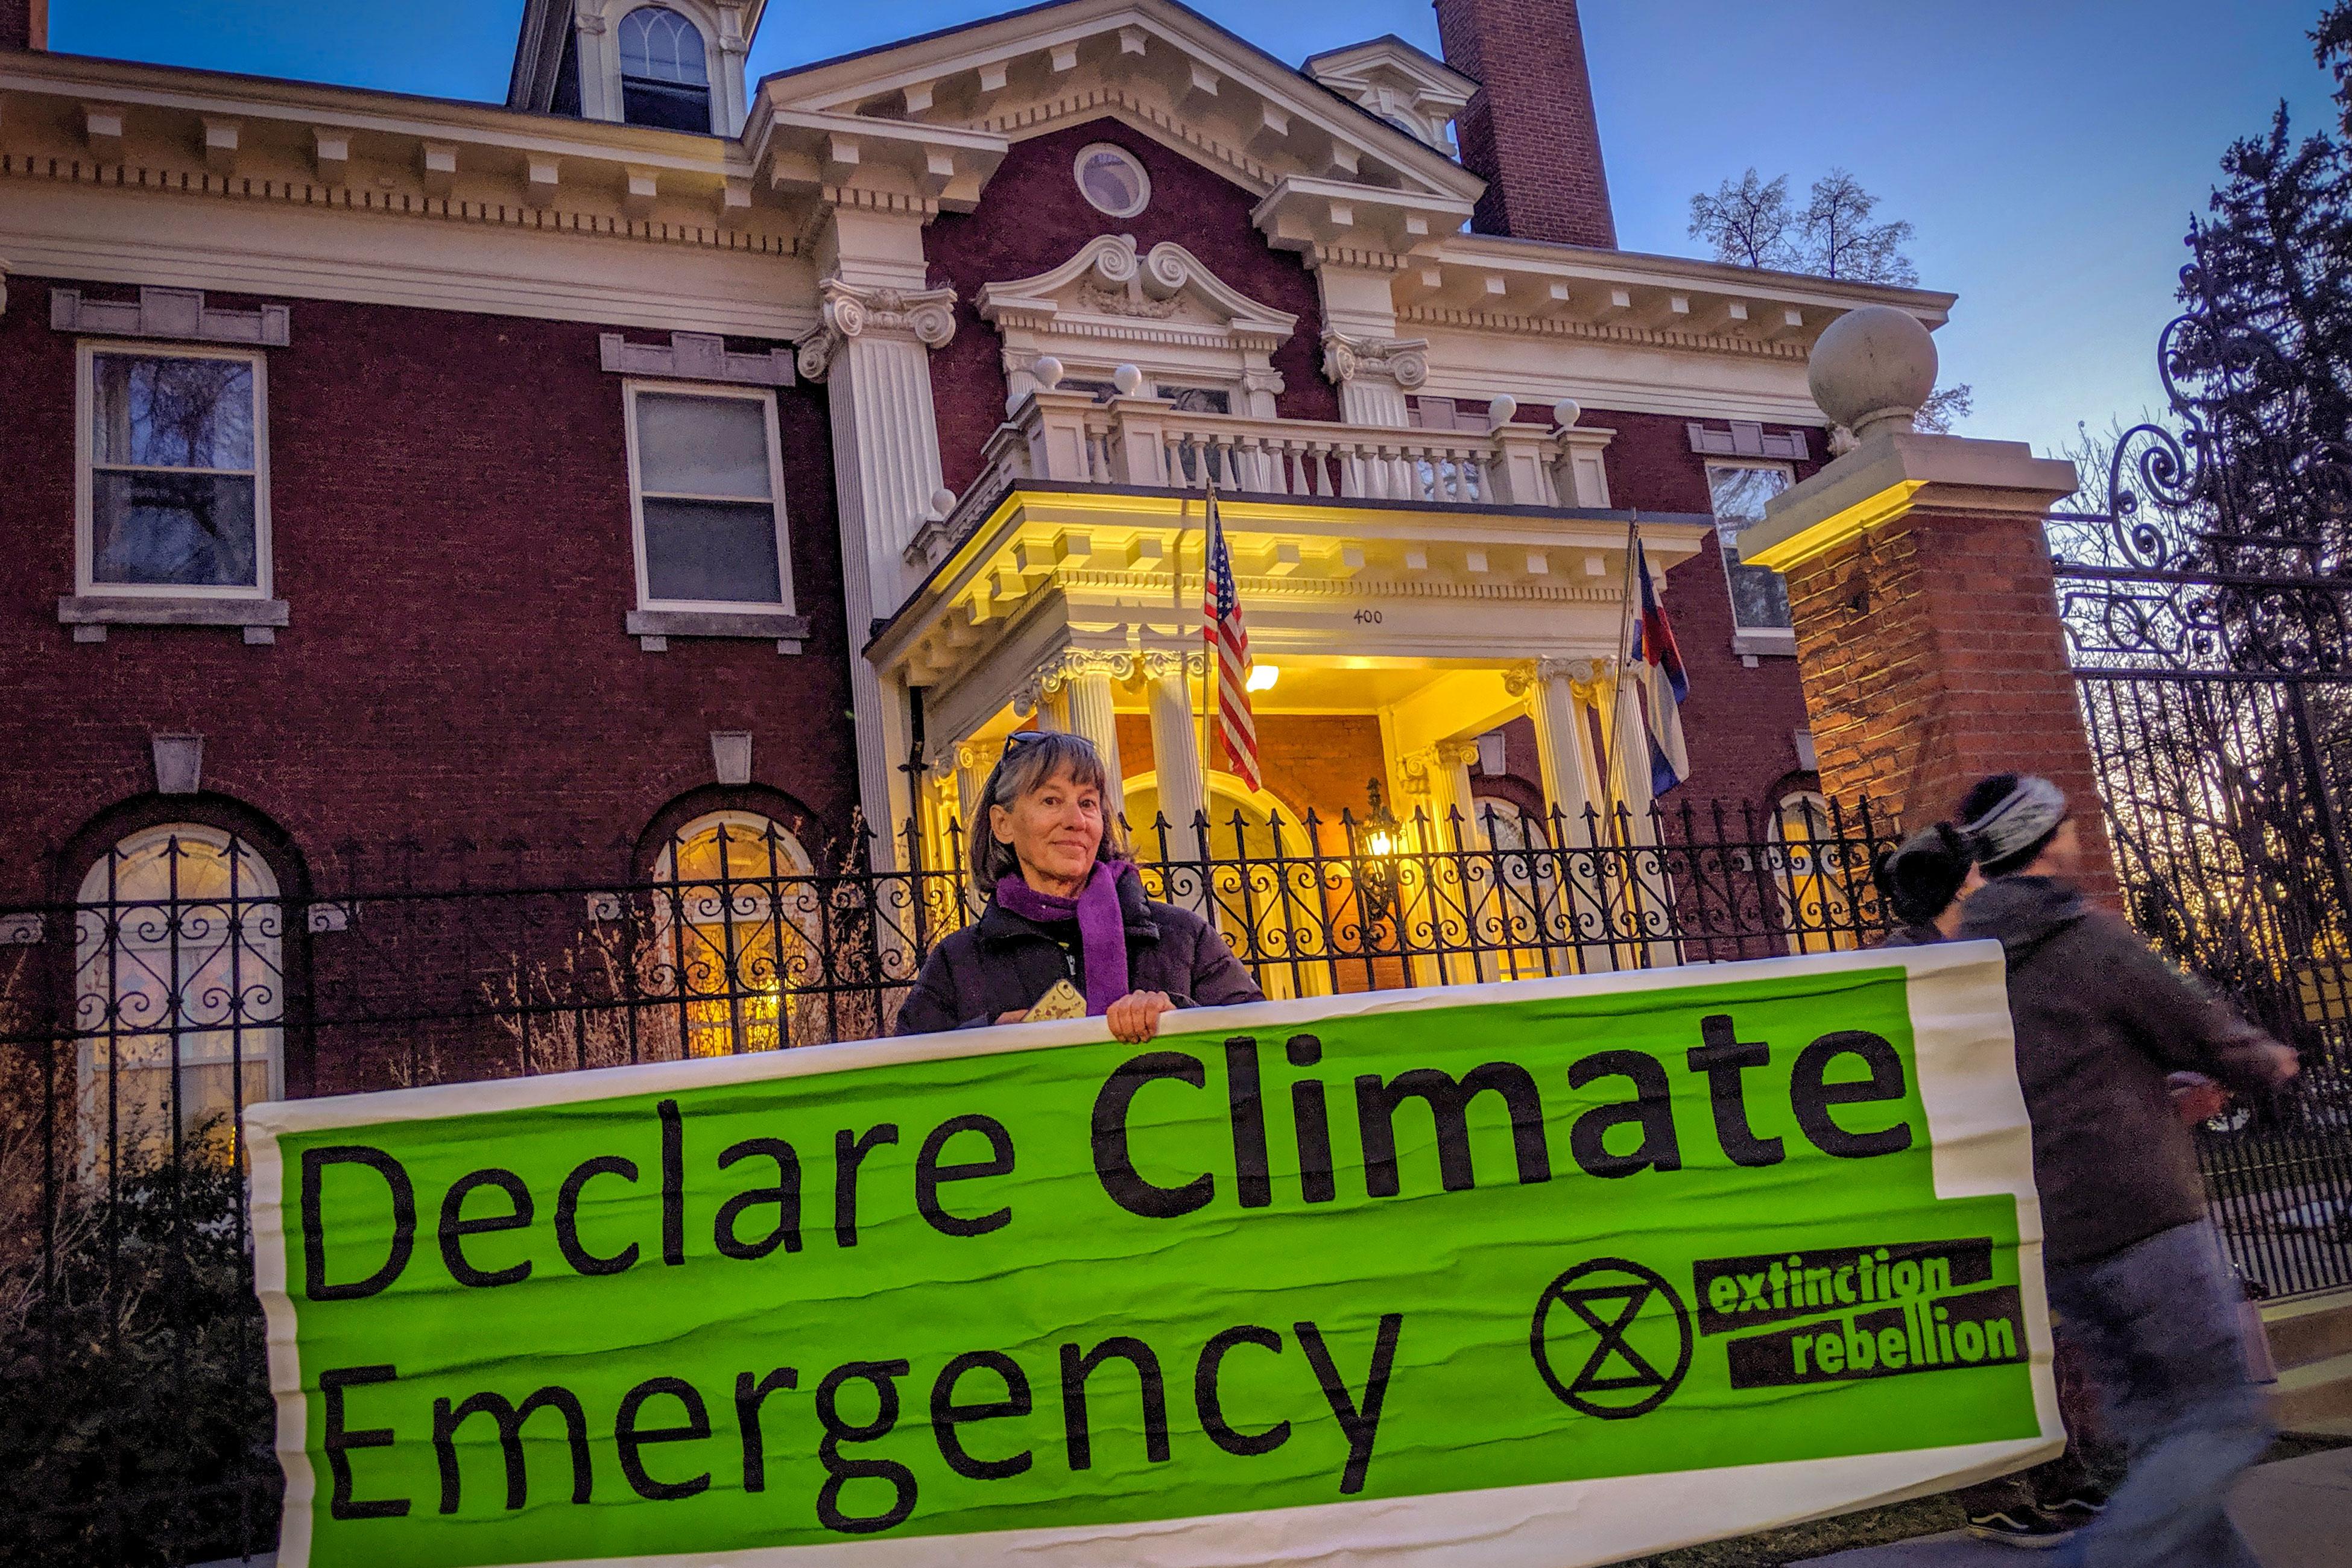 Dana Miller, an environmental activist in Denver, helped organize the disruption inside the Colorado's Governor's Residence., Nov. 7, 2019